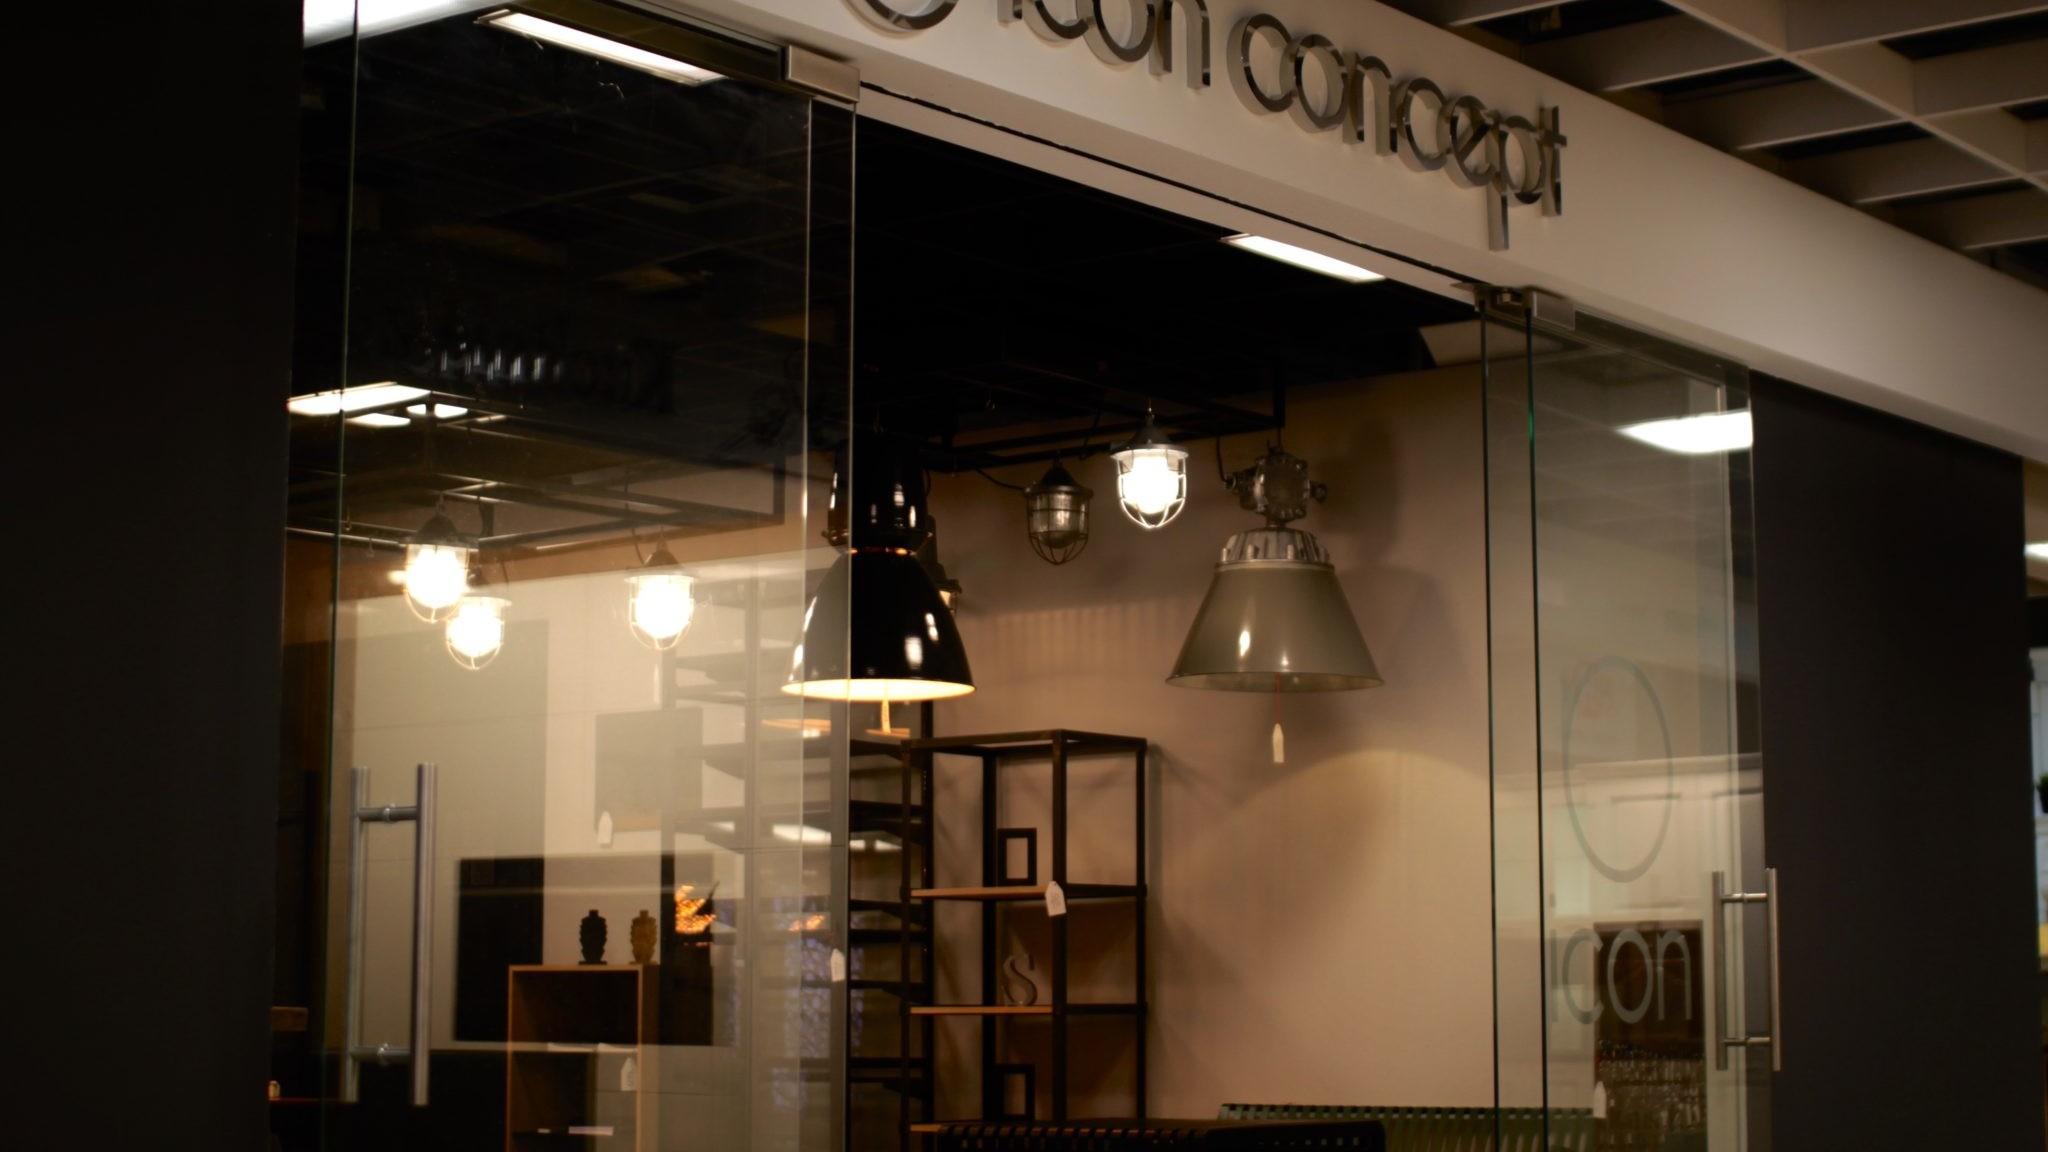 showroom Wrocław Icon Concept design, nowy showroom icon concept, meble, design, drzwi loftowe wroclaw